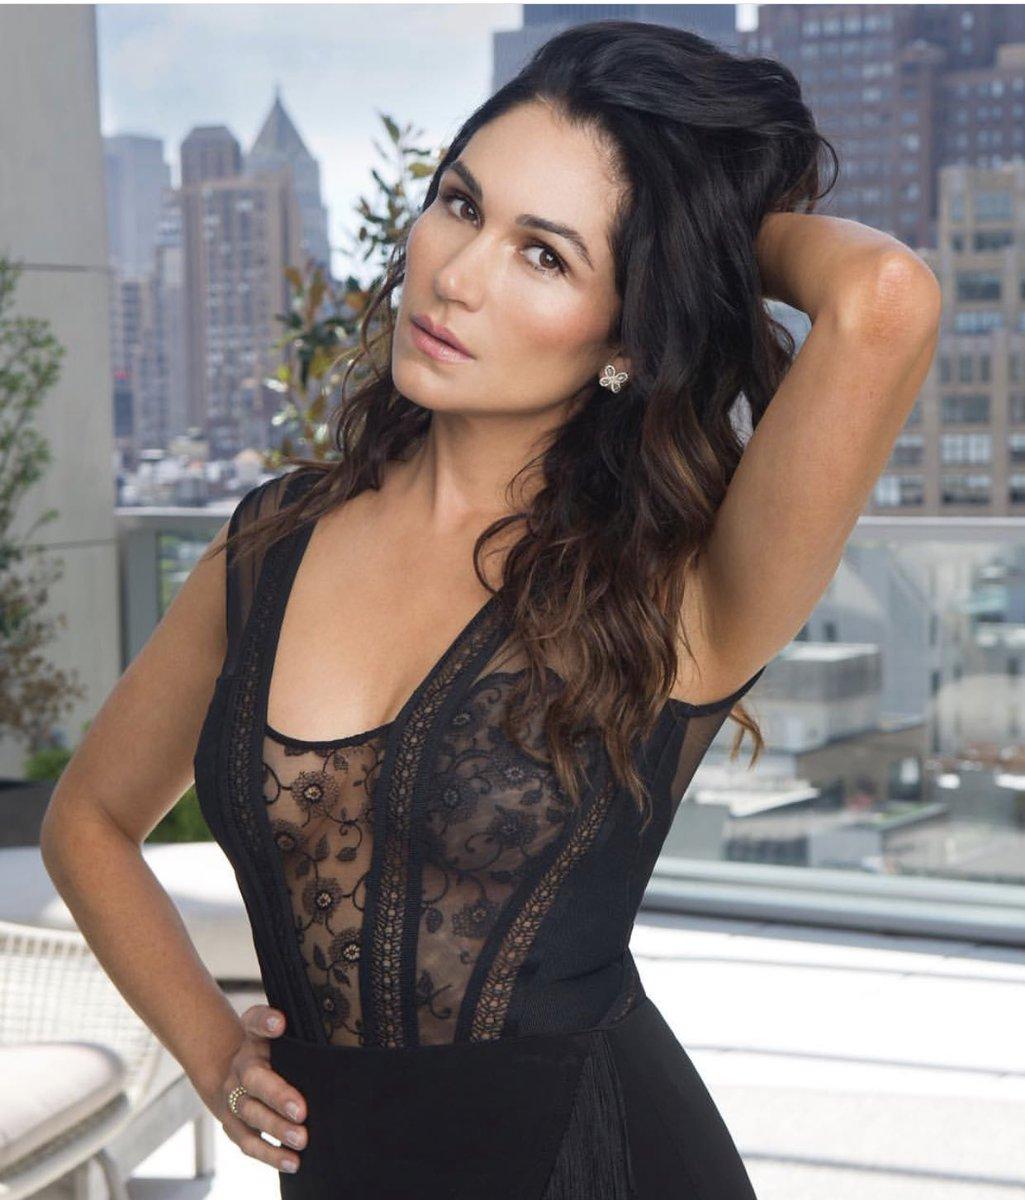 Lela Loren nude photos 2019